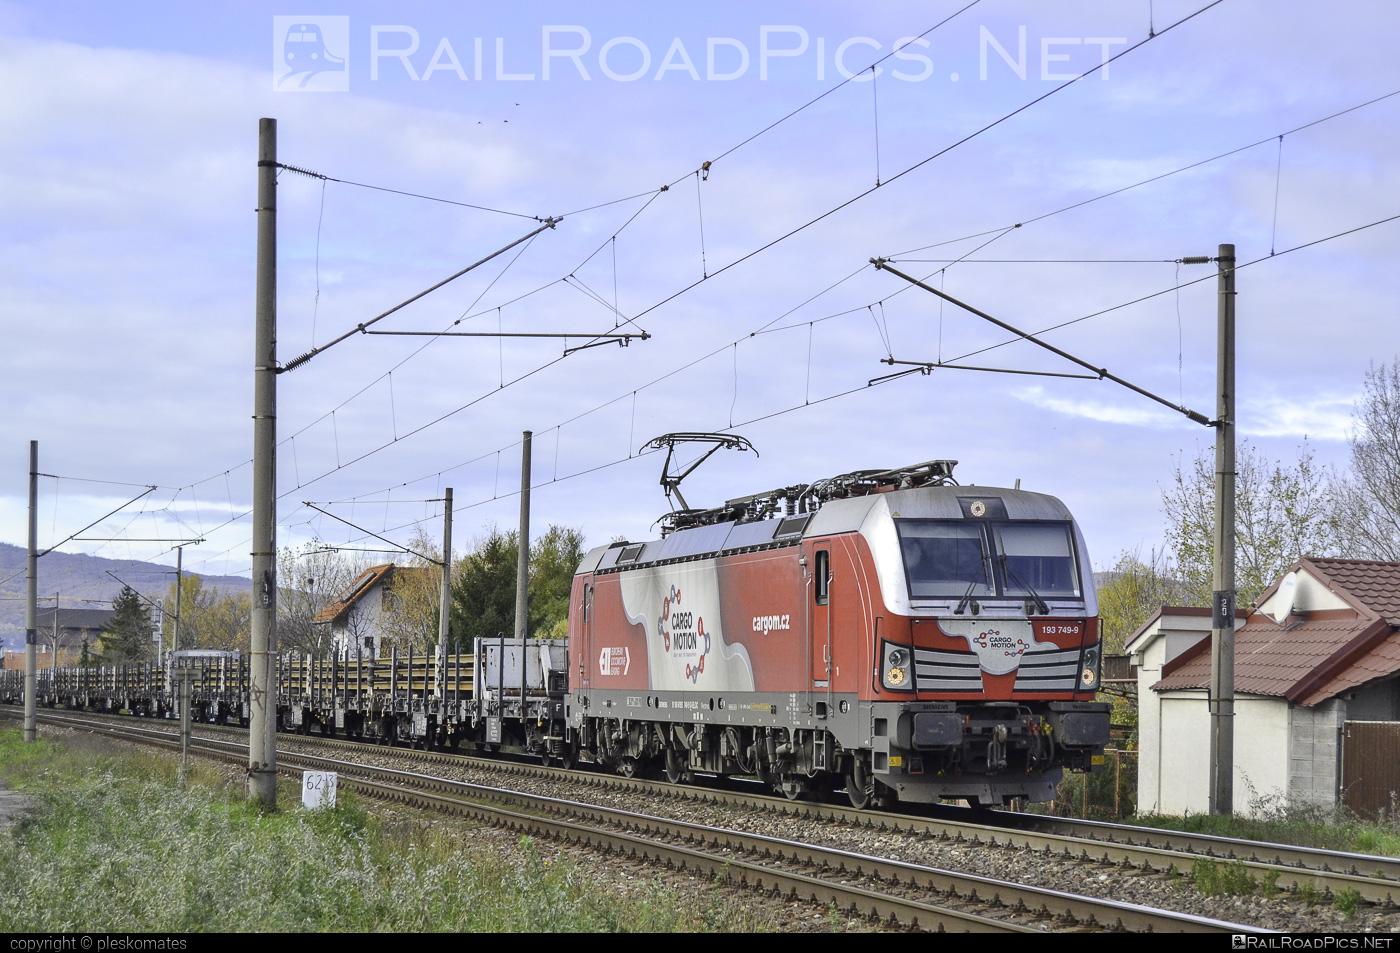 Siemens Vectron MS - 193 749-9 operated by Cargo Motion s.r.o. #CargoMotion #CargoMotionAS #ell #ellgermany #eloc #europeanlocomotiveleasing #siemens #siemensvectron #siemensvectronms #vectron #vectronms